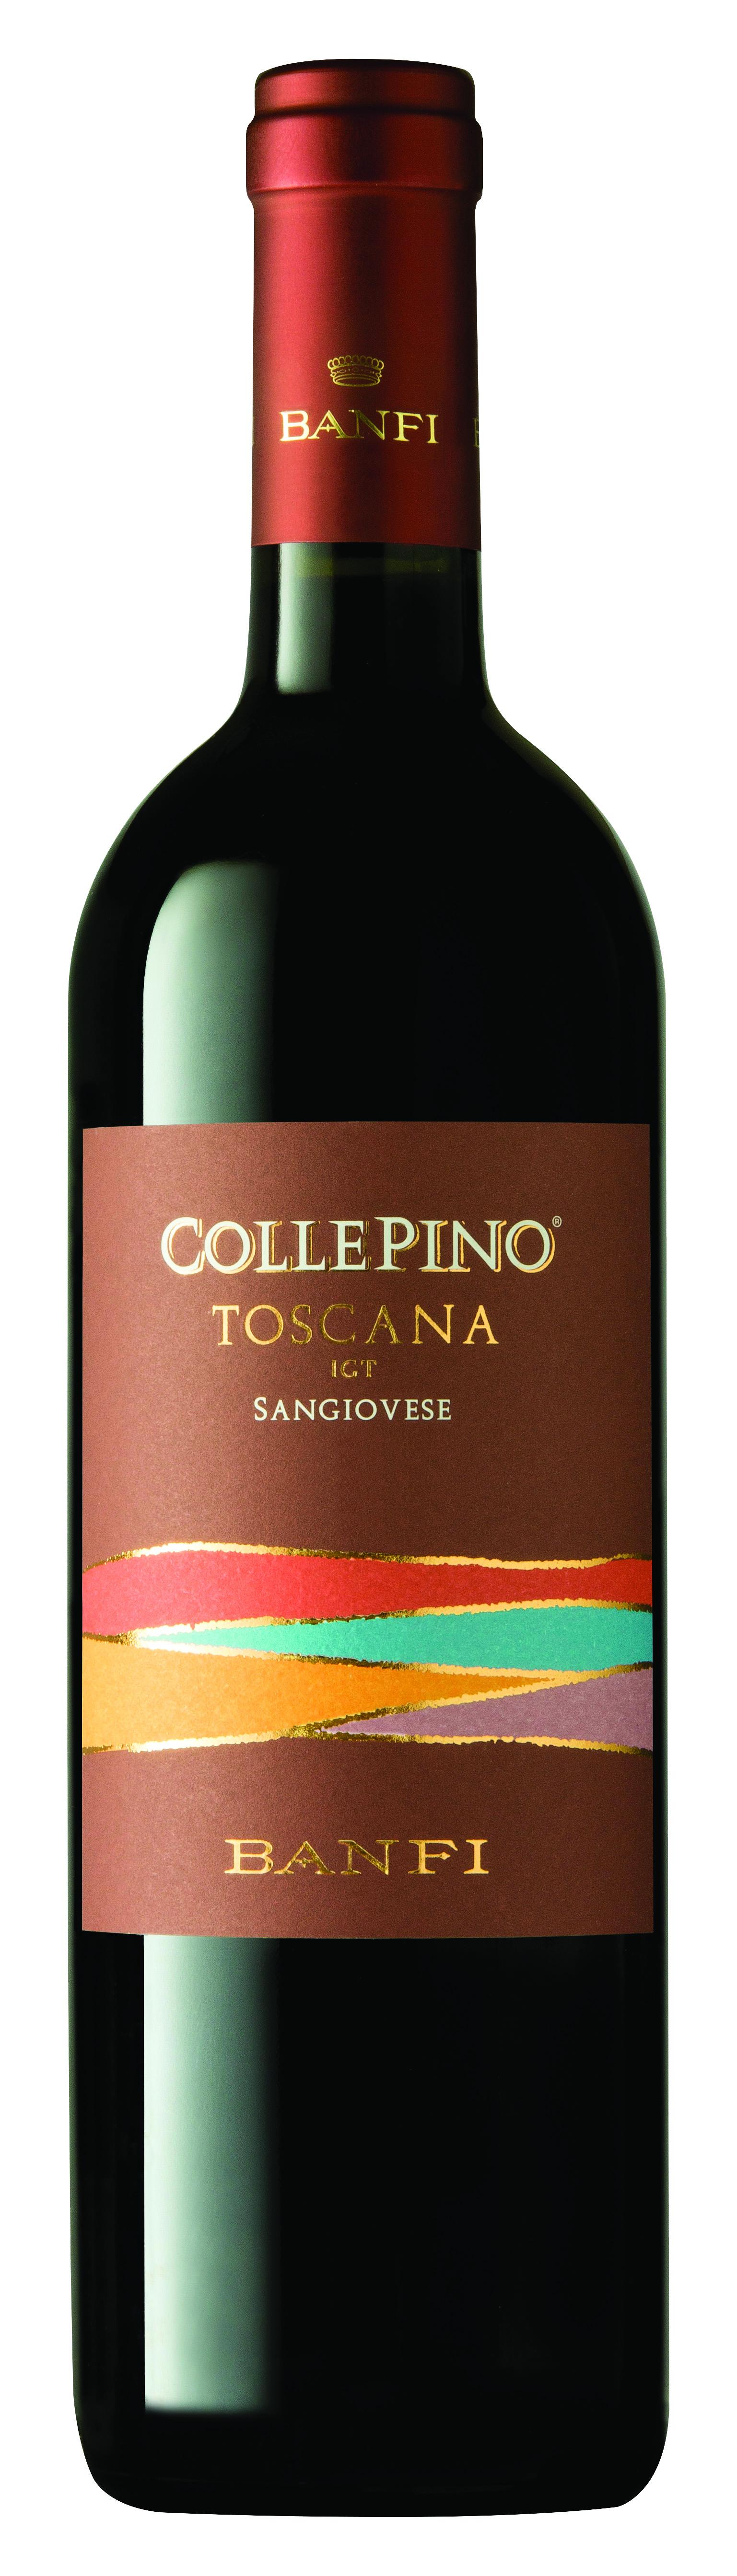 Banfi Collepino Sangiovese 750ml NV